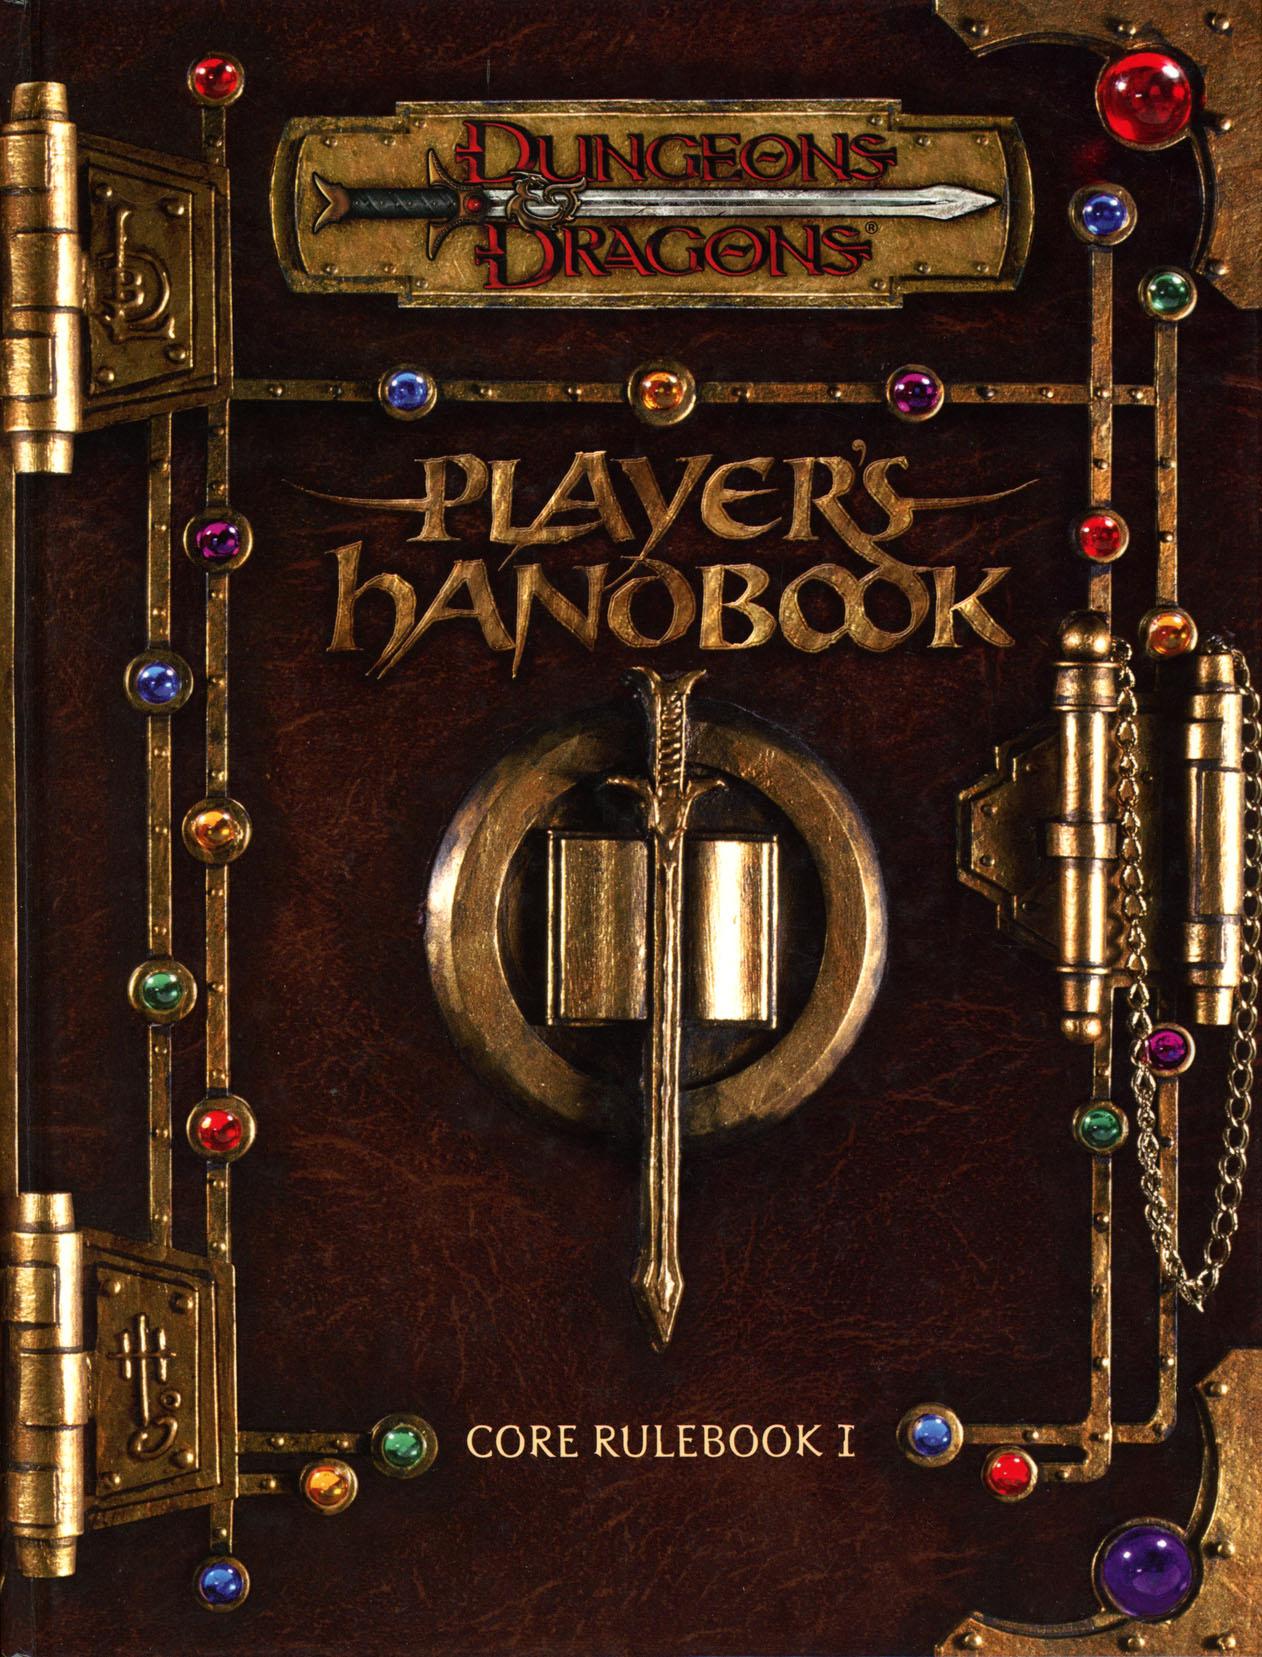 Players Handbook 3rd